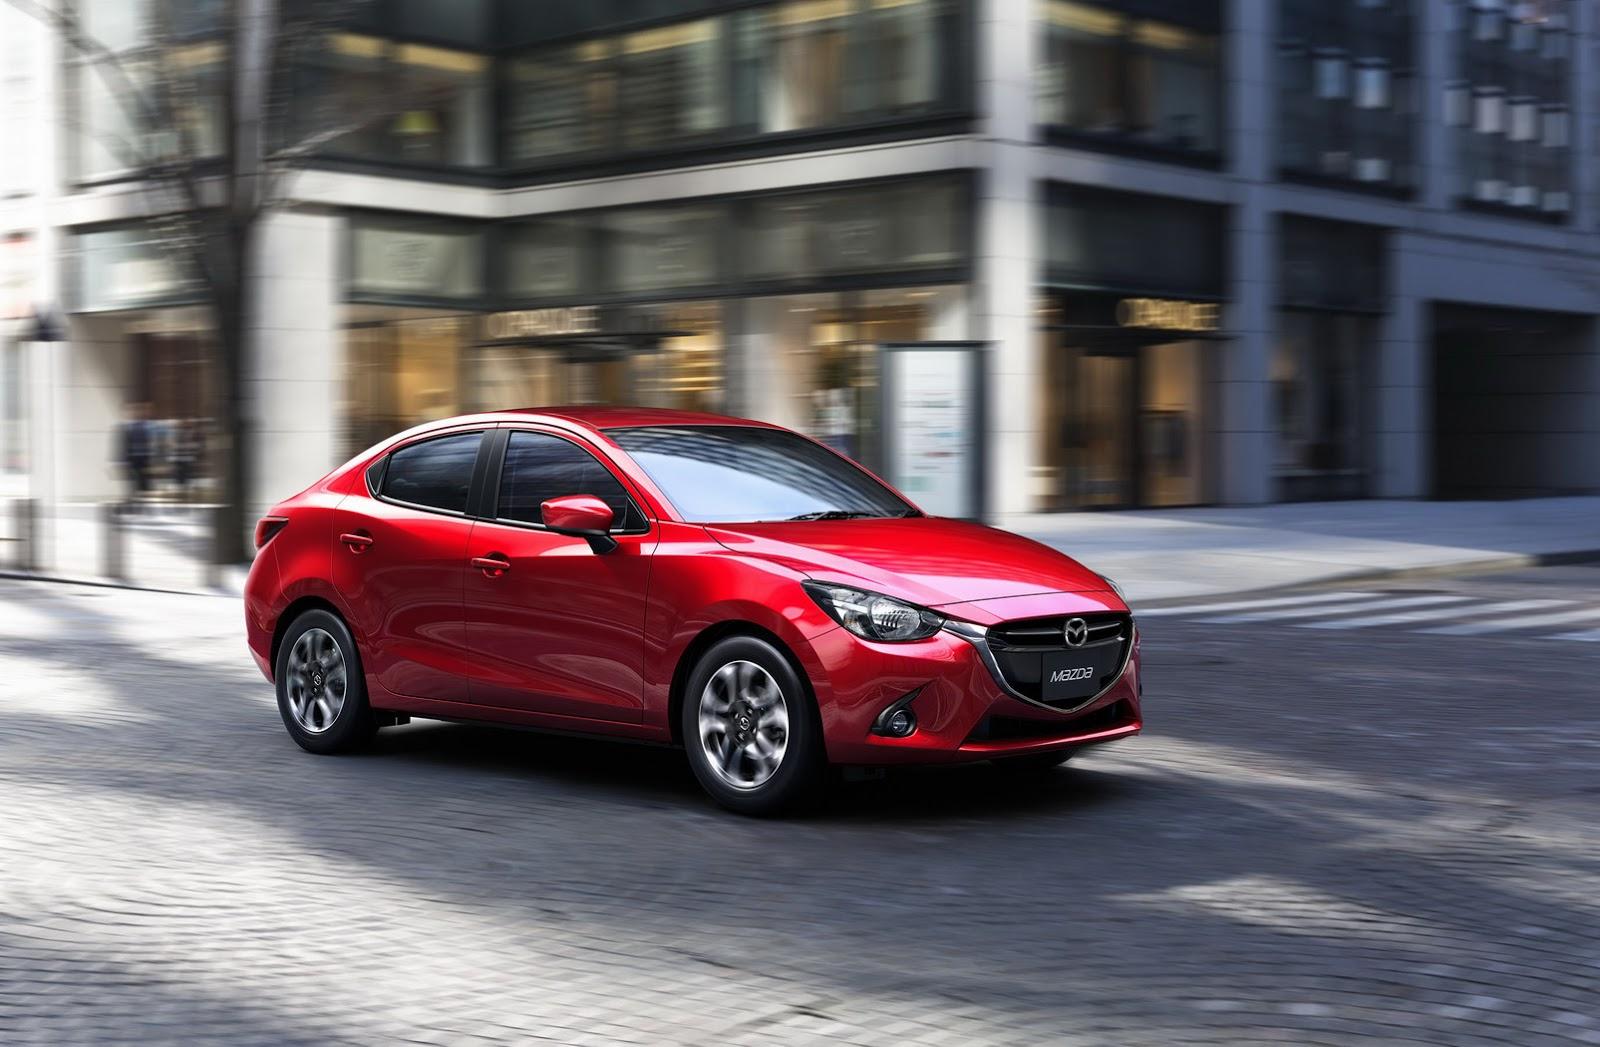 Giá xe Mazda 2